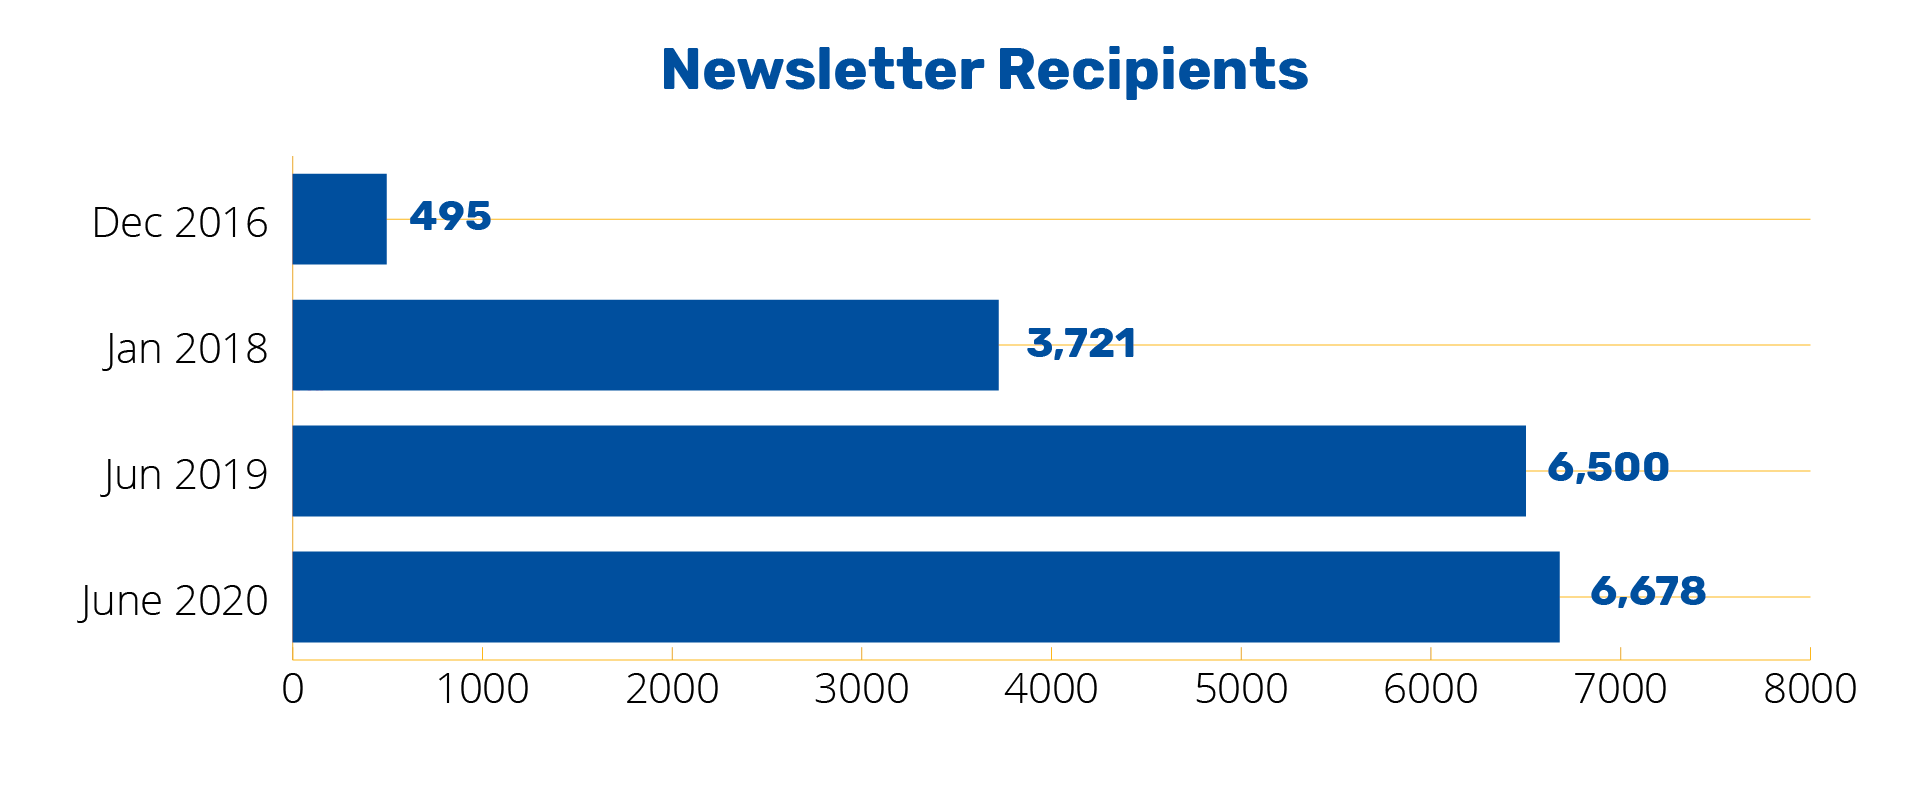 Annual Report 2020 - Teaching Center Annual Report 2020 Newsletter Recipient chart